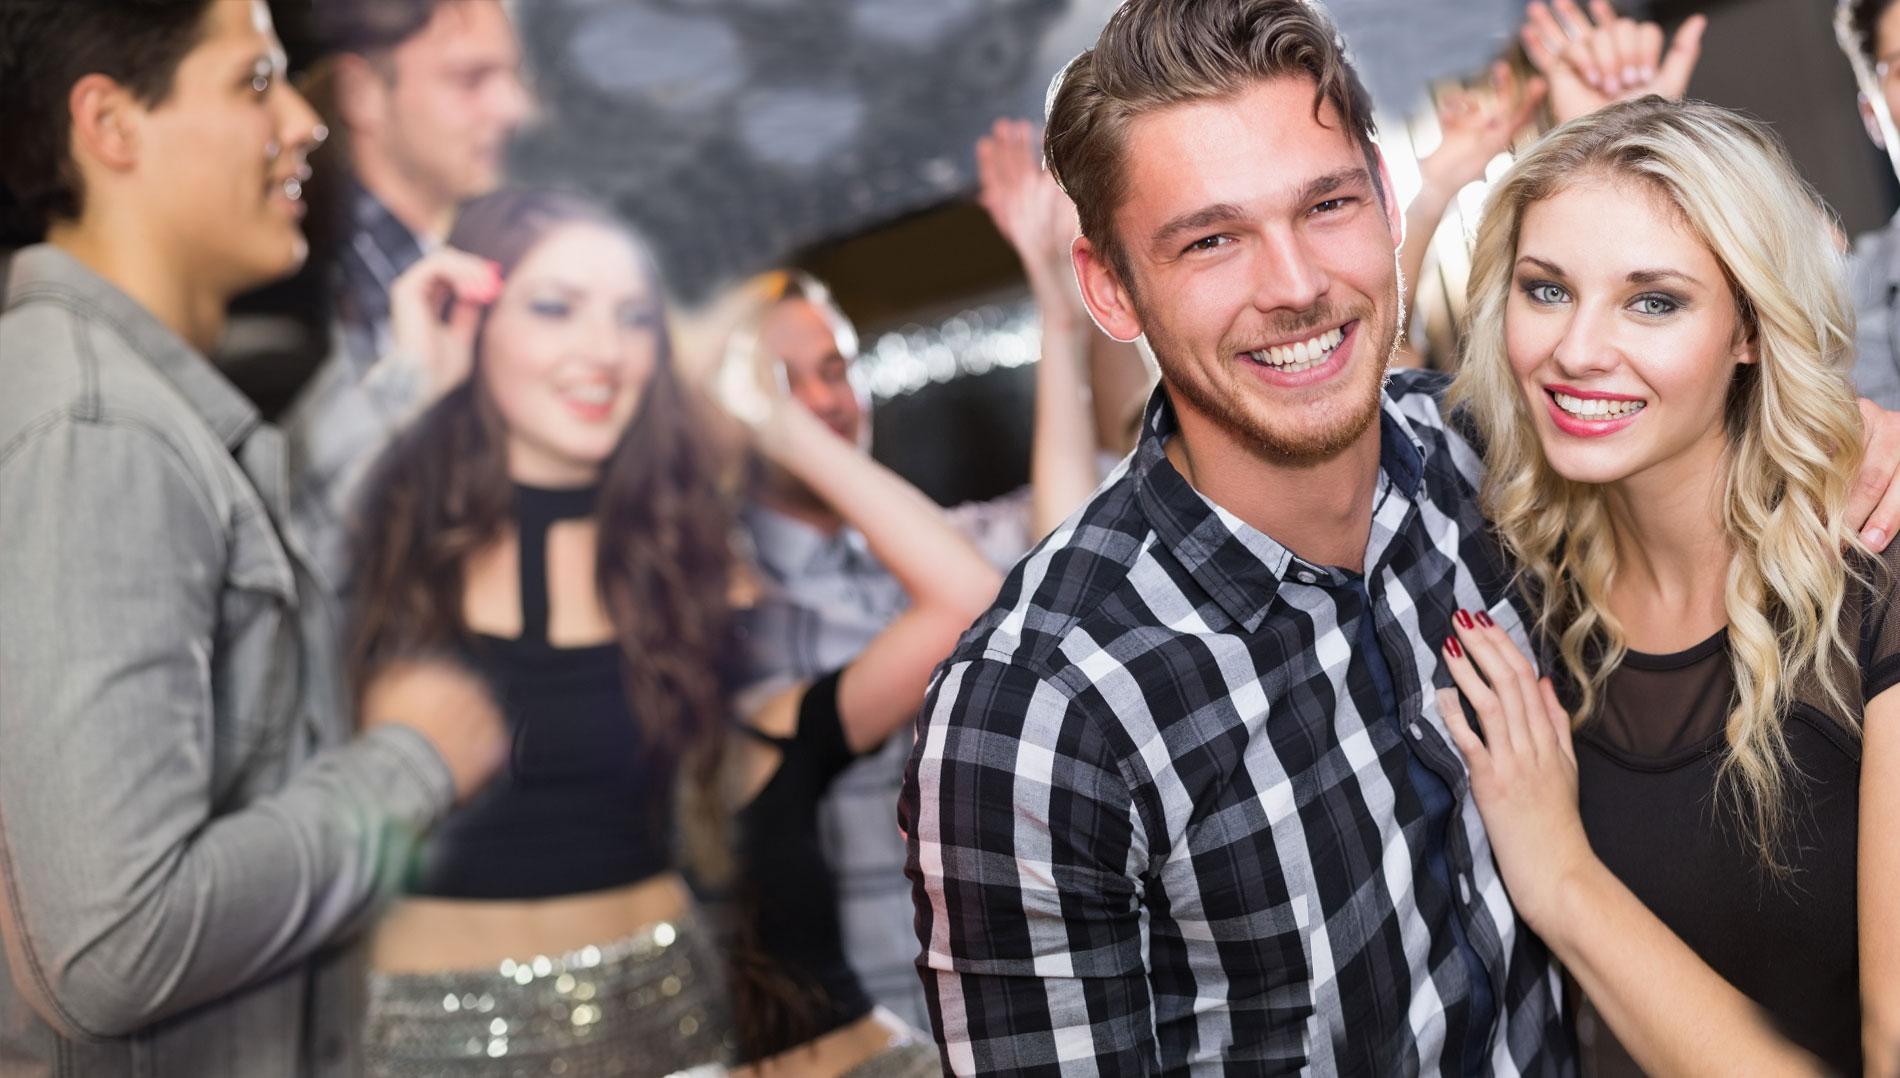 Tanzpartner aus Paderborn